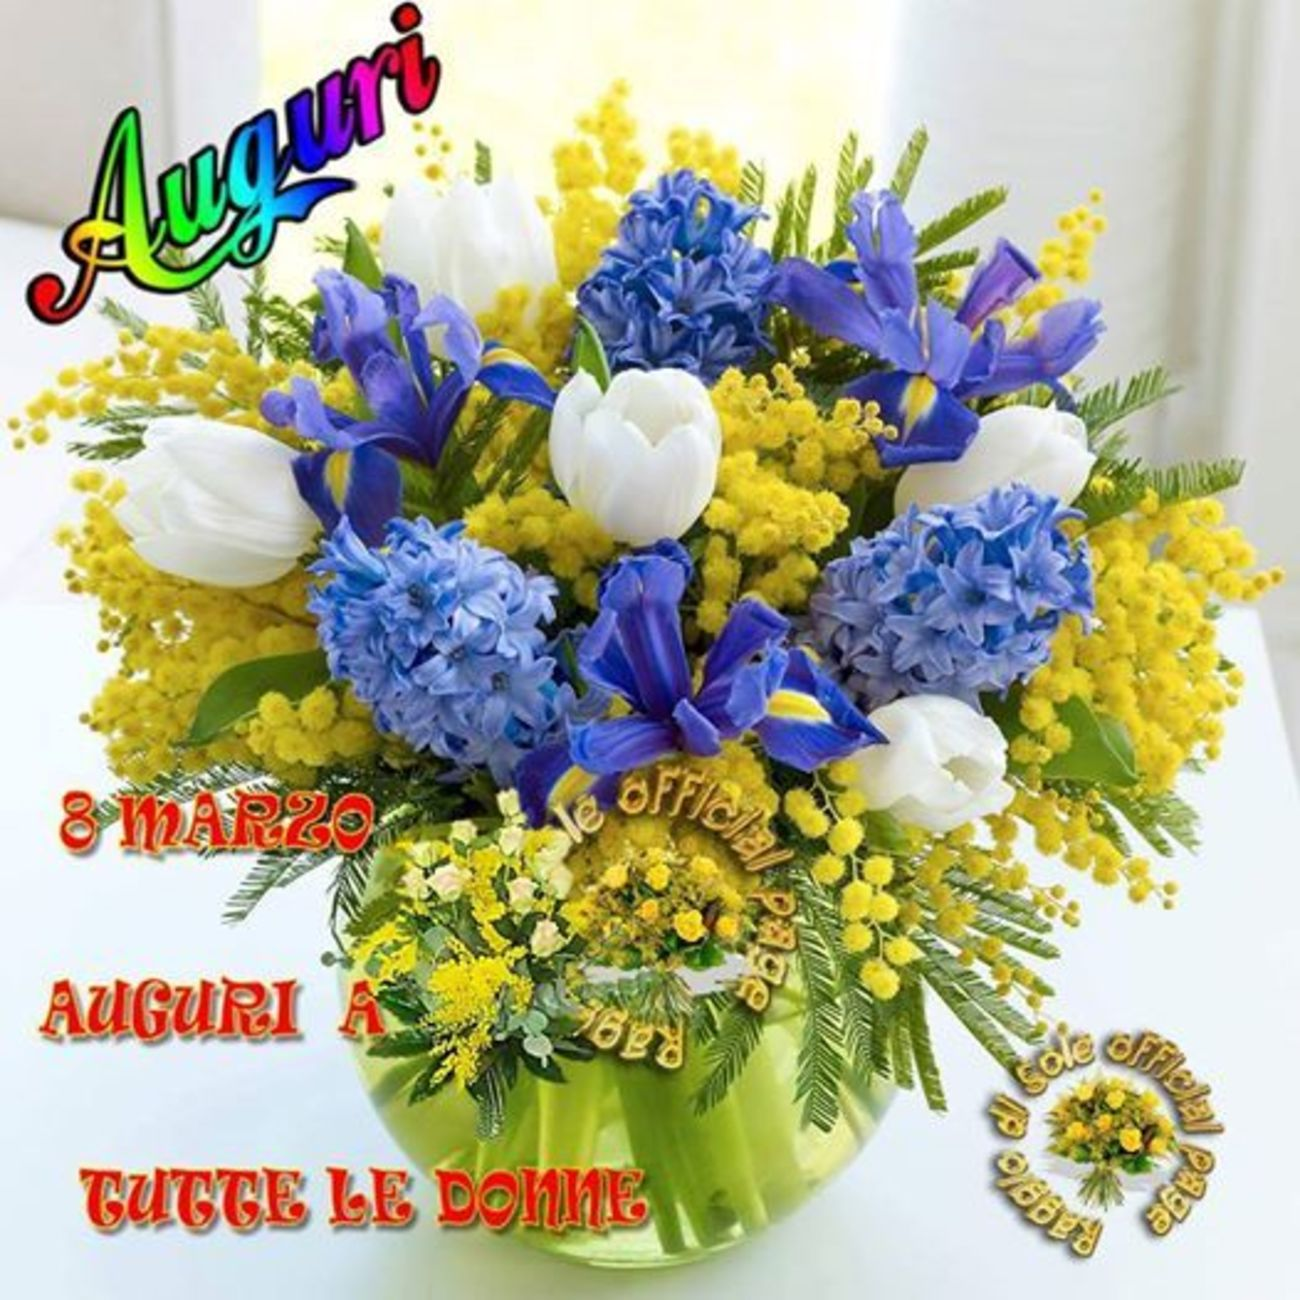 Buona Festa Della Donna Auguri Gratis Bellissimeimmaginiit